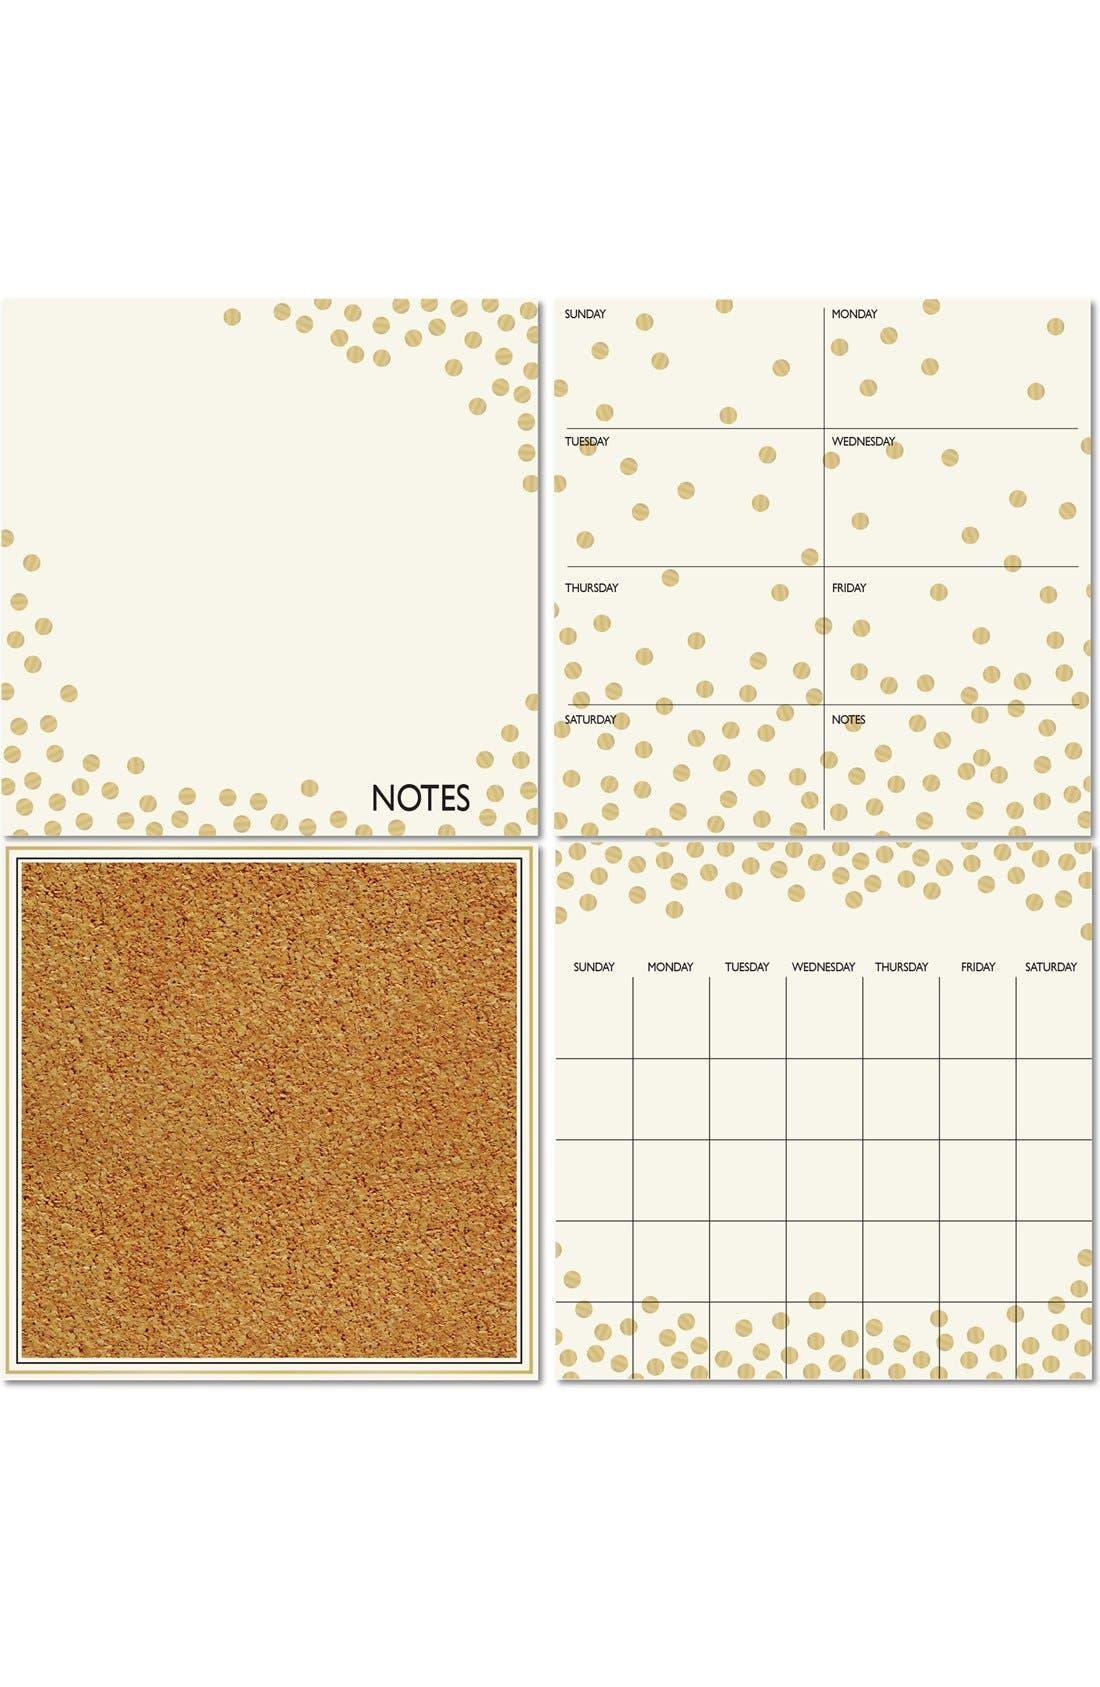 Alternate Image 1 Selected - Wallpops 'Confetti' Wall Decal Organization Kit